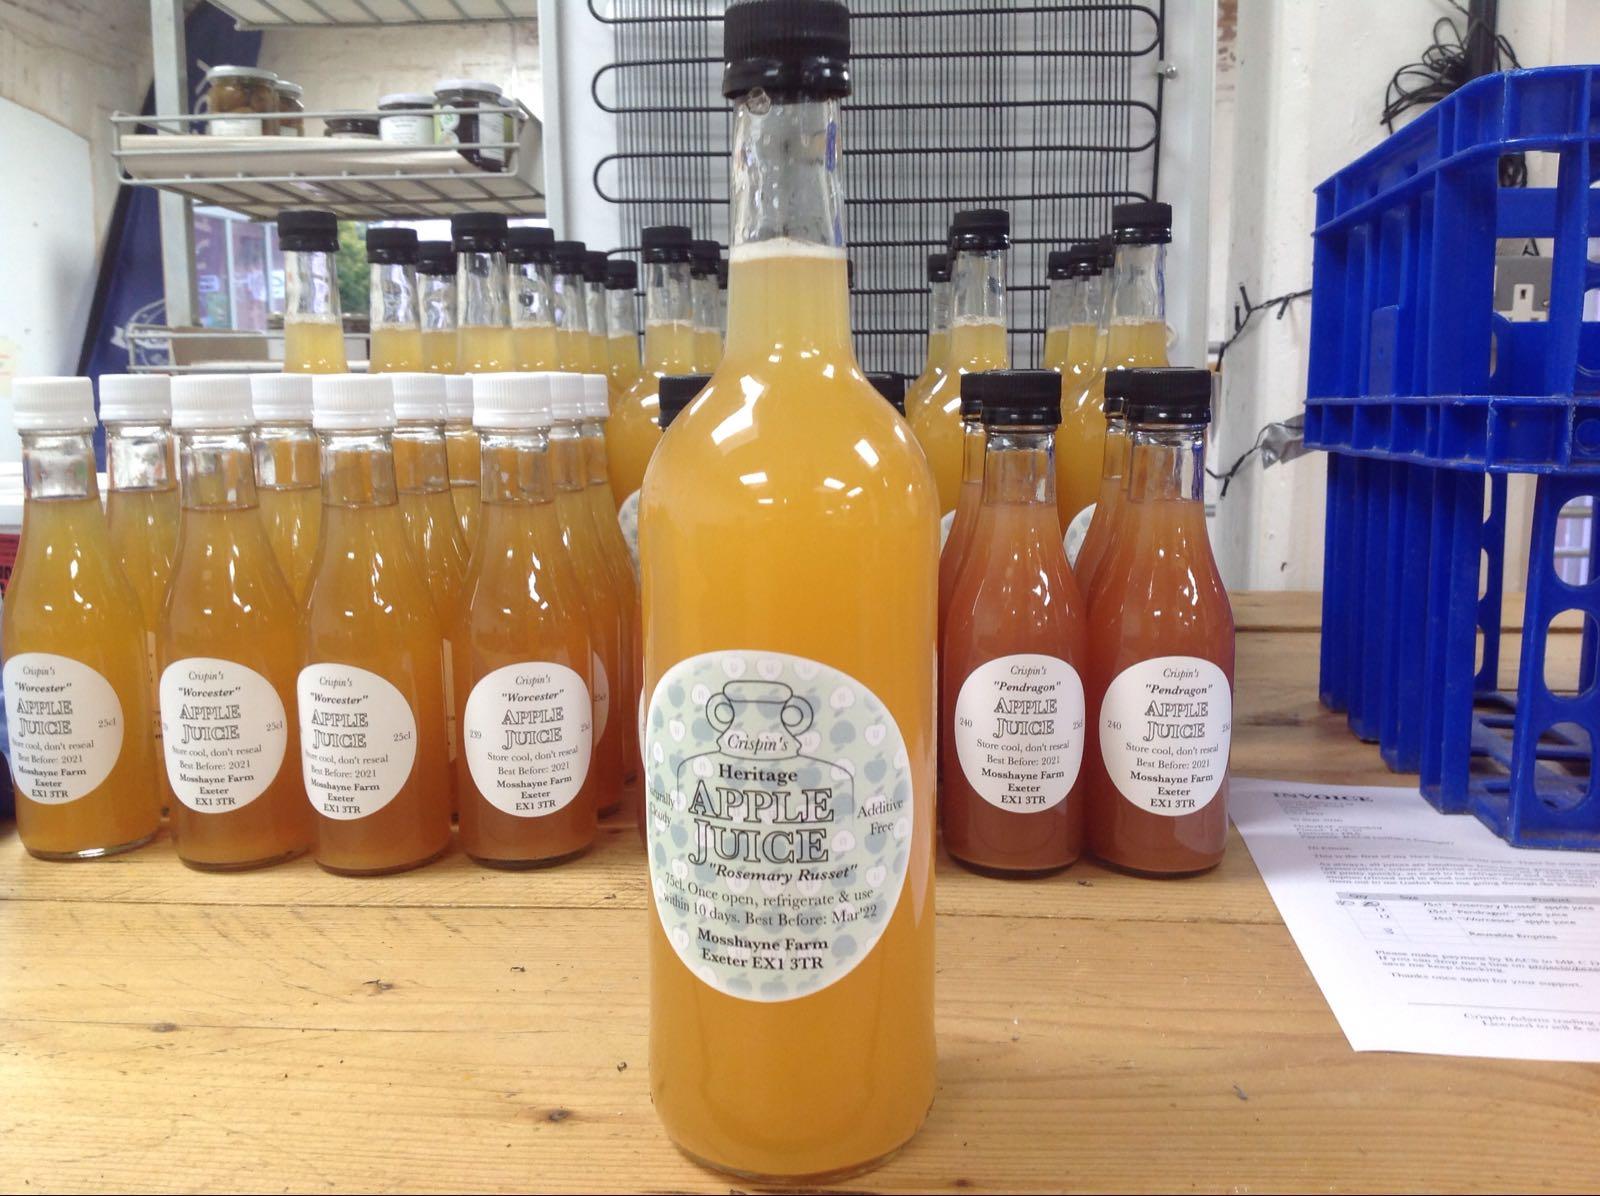 Crispin's Apple juice large